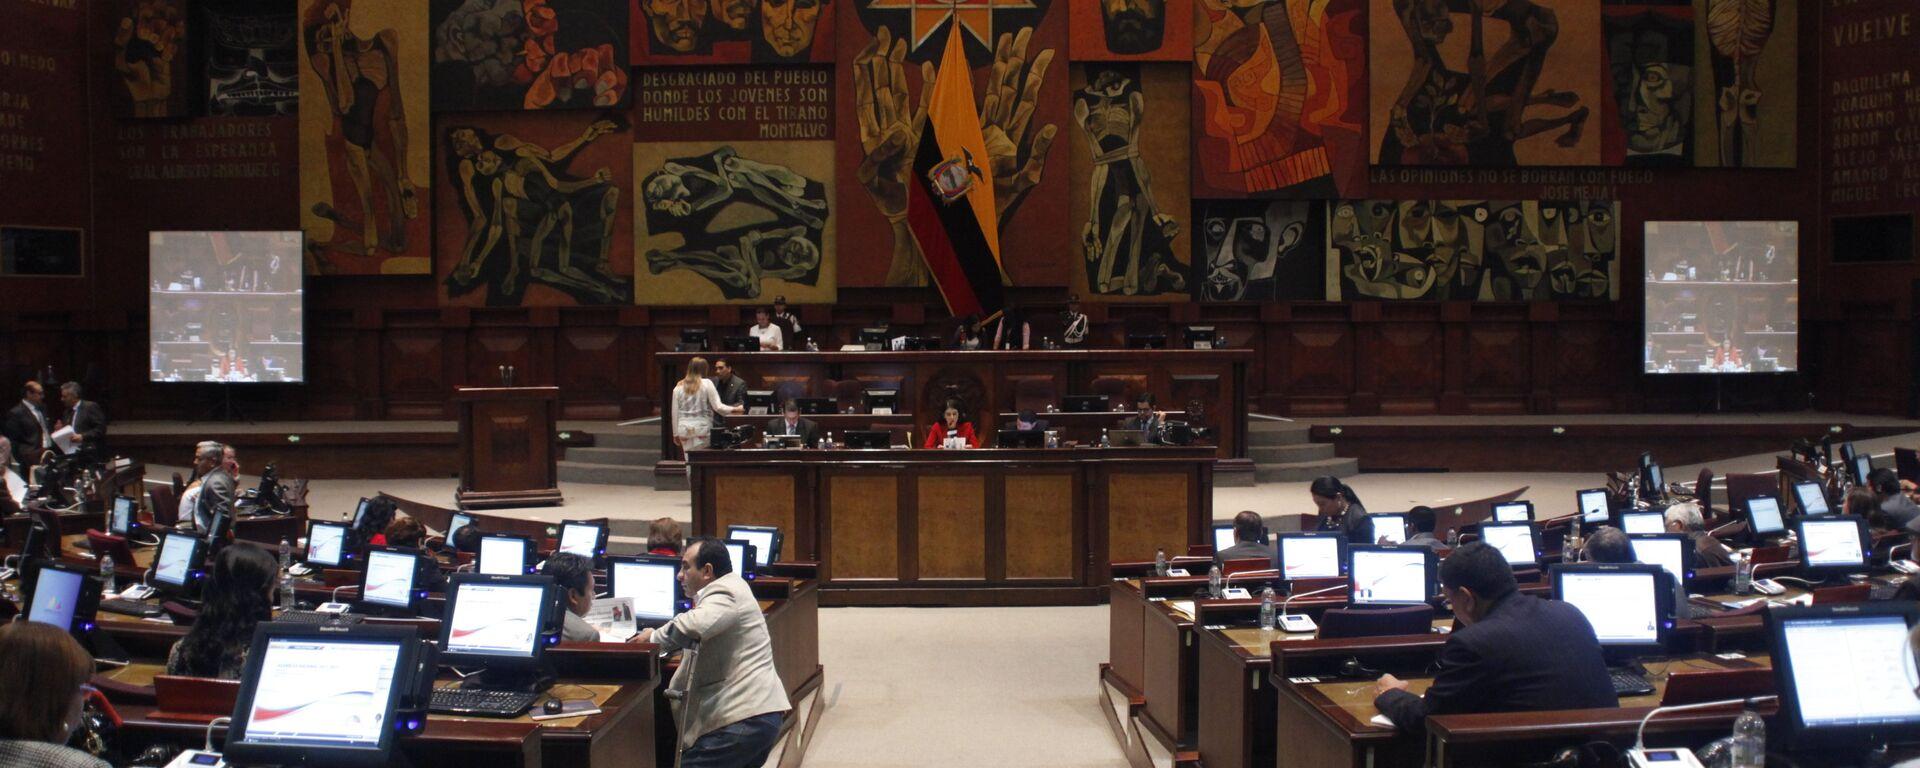 La Asamblea Nacional de Ecuador (archivo) - Sputnik Mundo, 1920, 17.12.2020